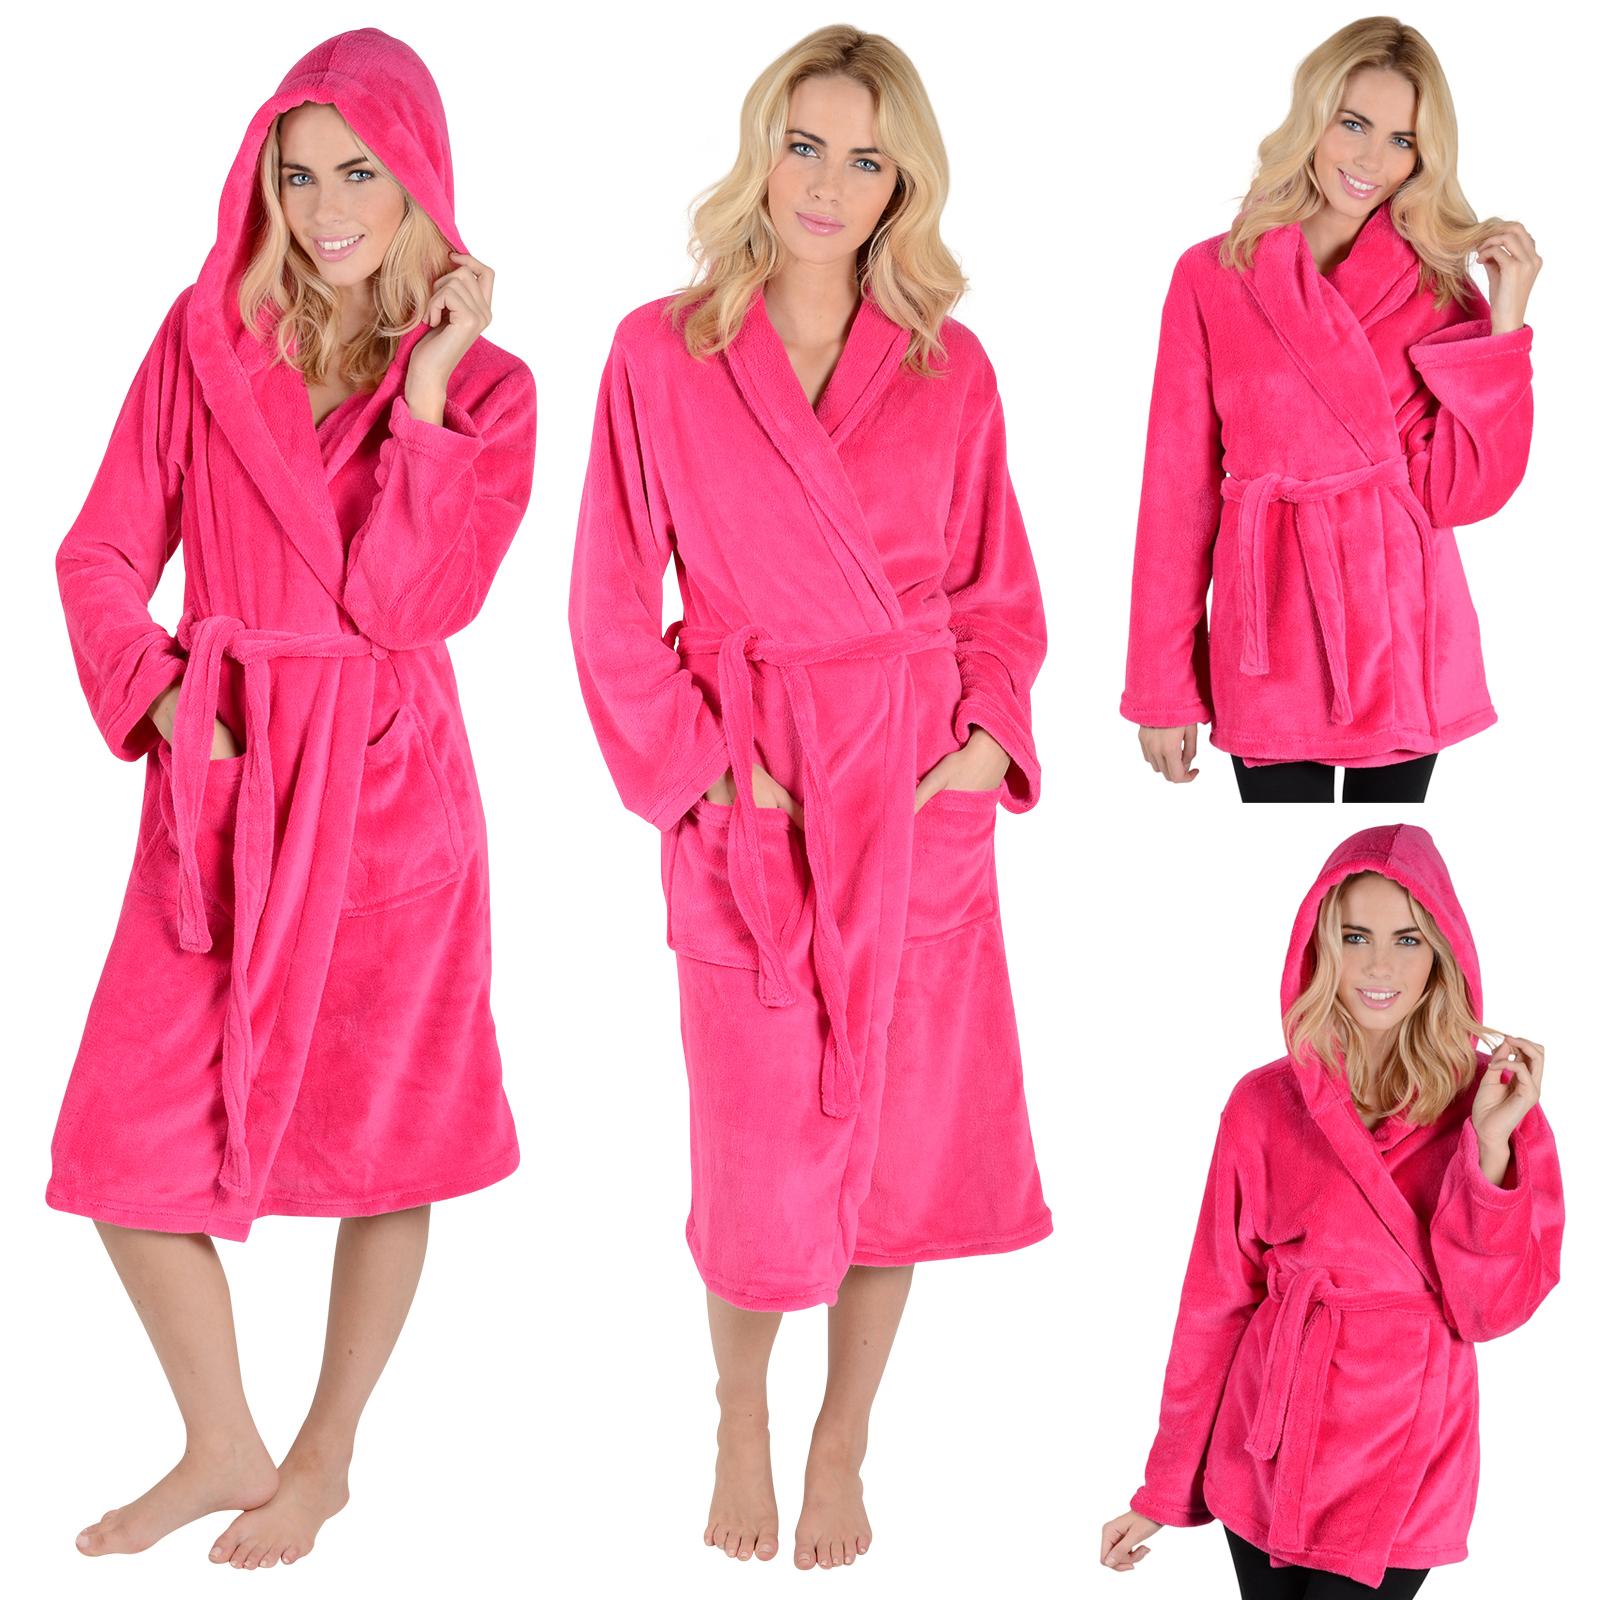 Ladies & Mens Fleece Bath Robe Dressing Gown Housecoat Bathrobe - A ...